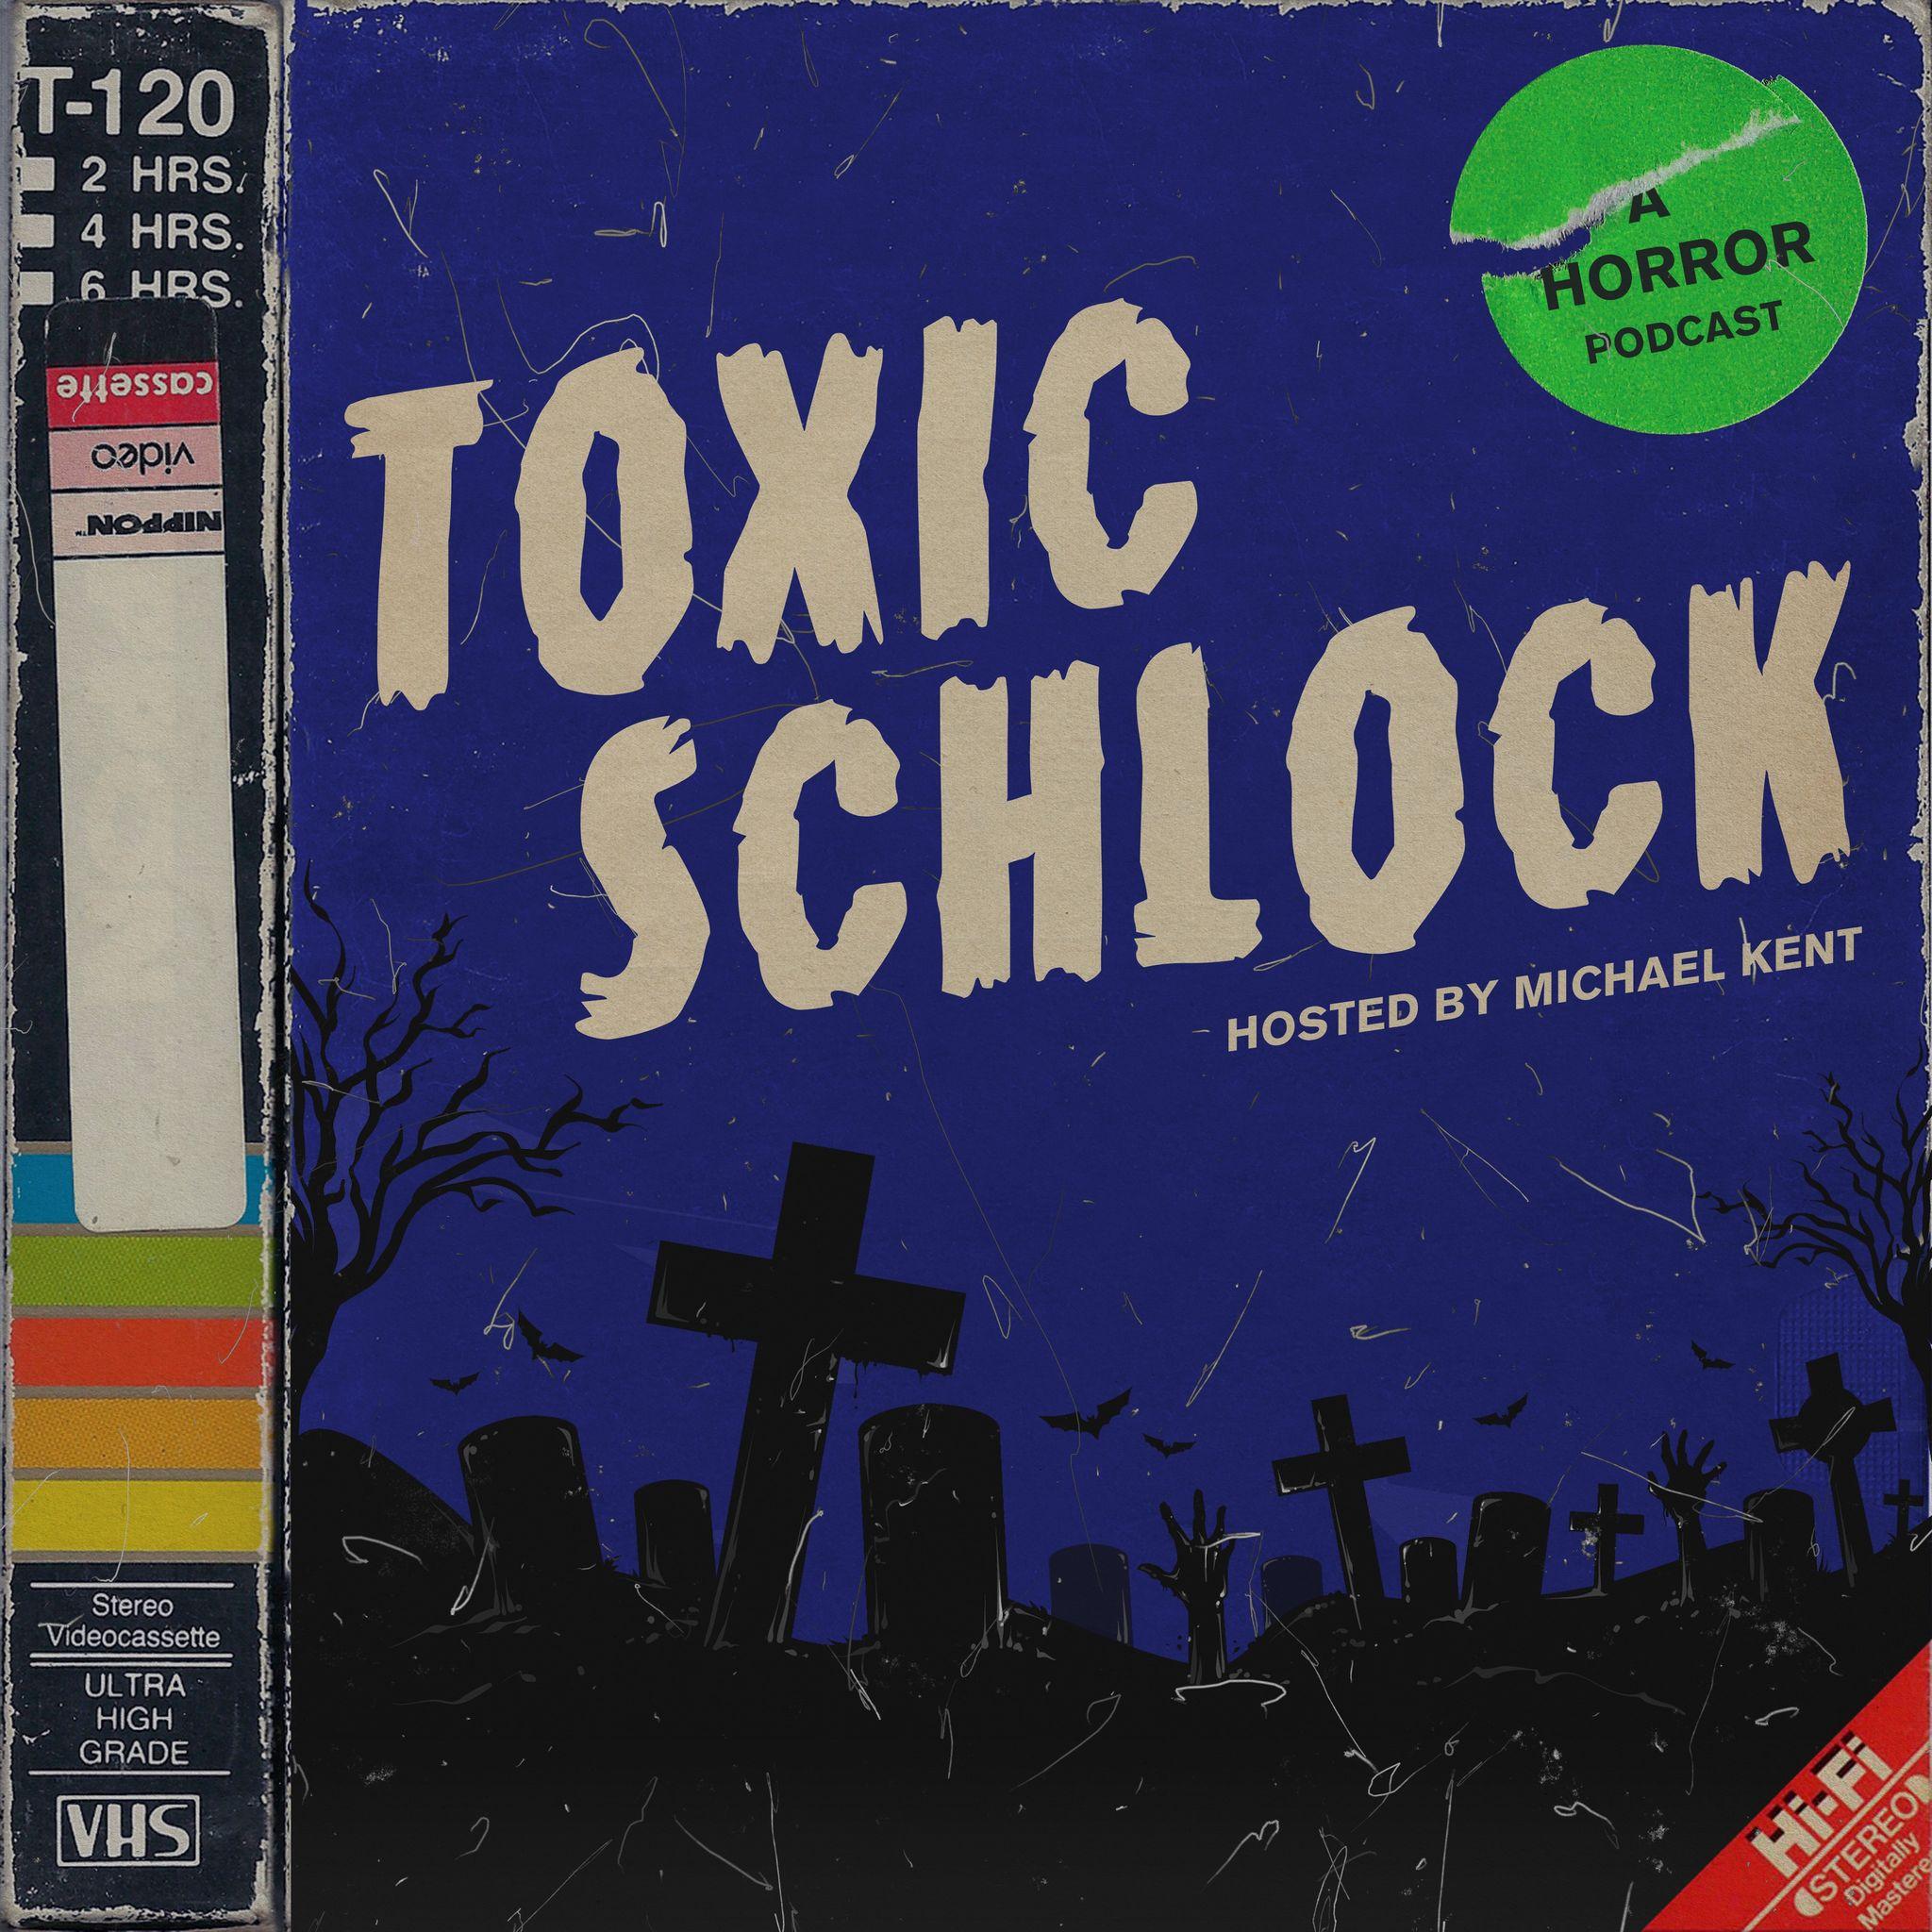 Toxic Schlock: Horror Podcast show art